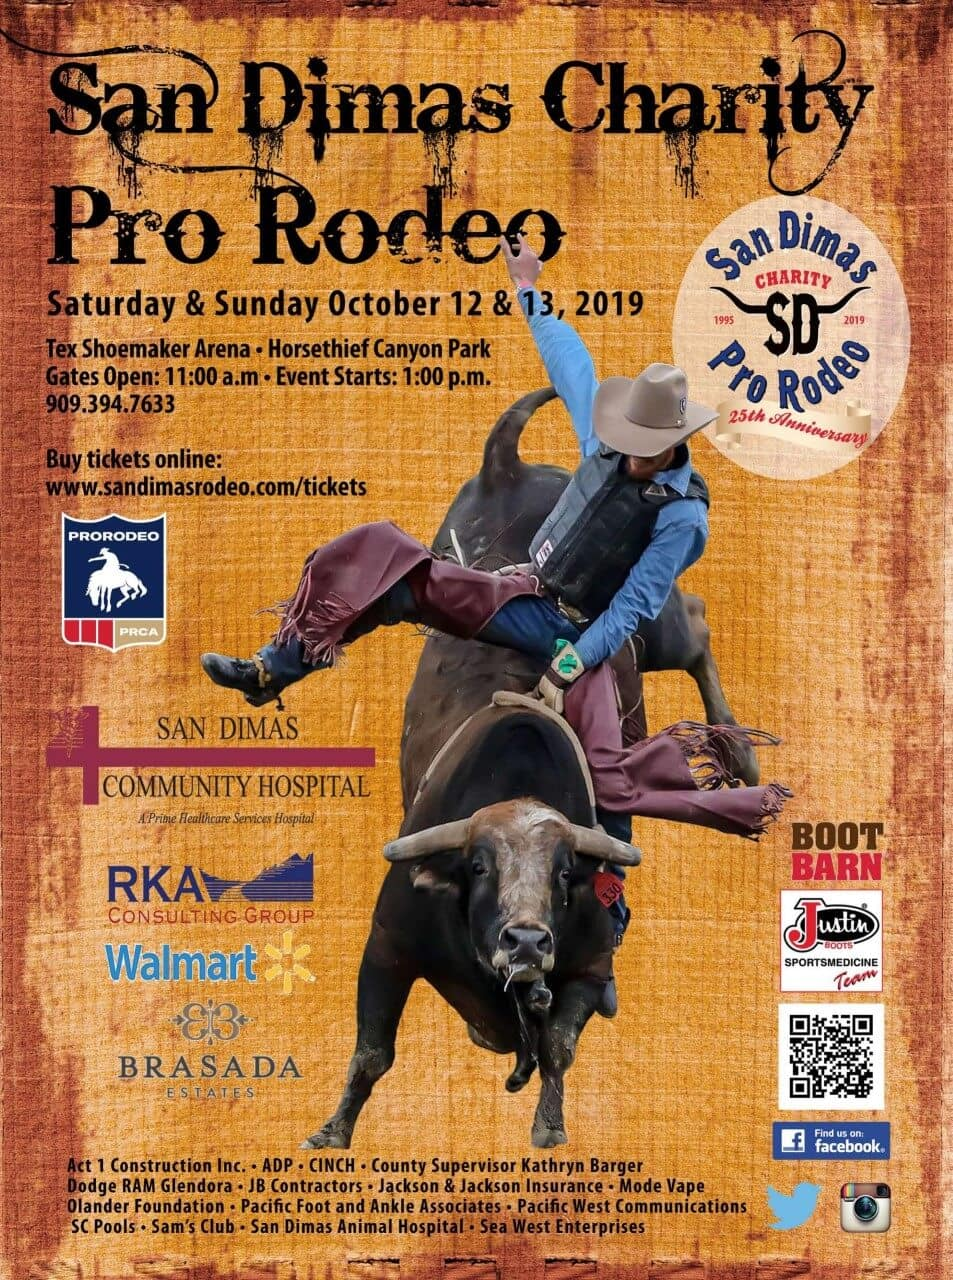 San Dimas Charity Pro Rodeo